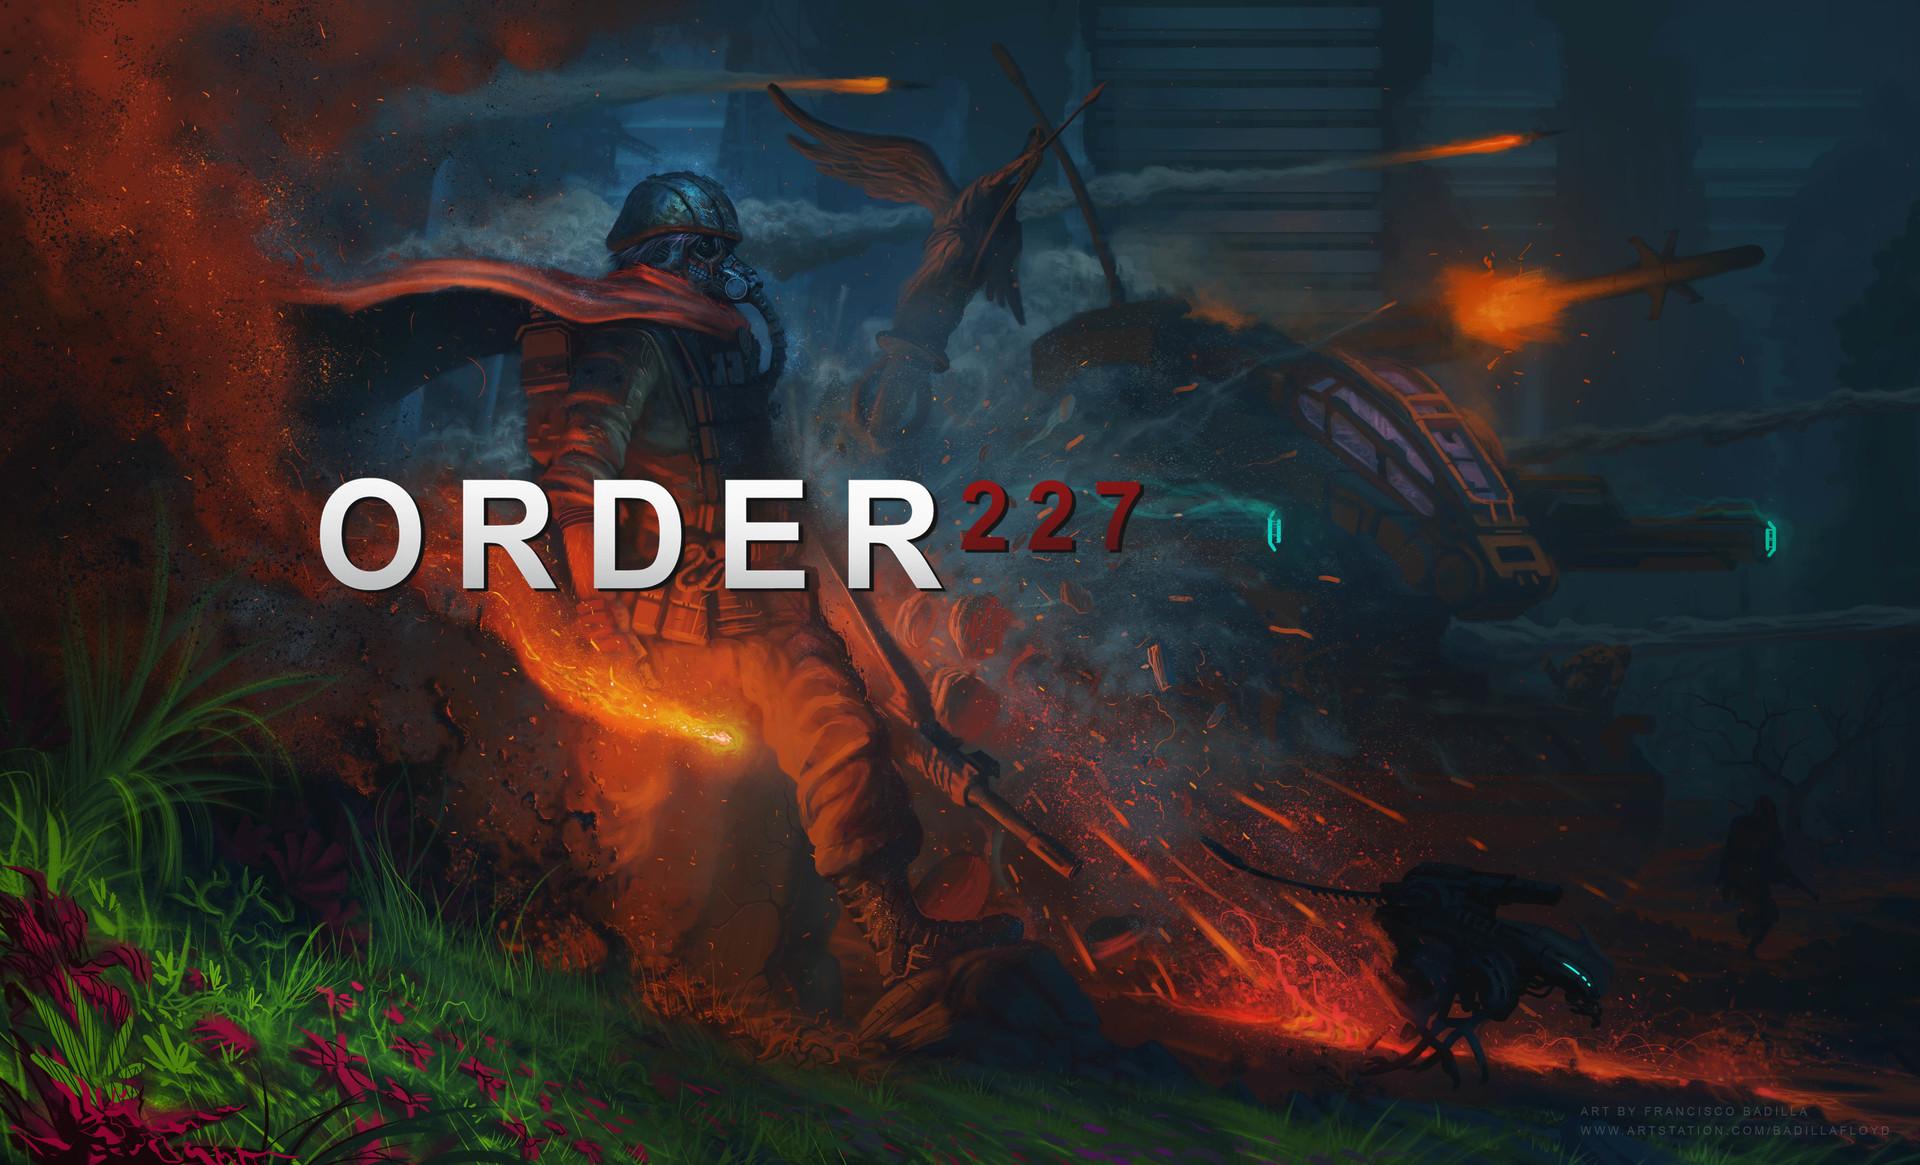 Francisco badilla order 227 cover art